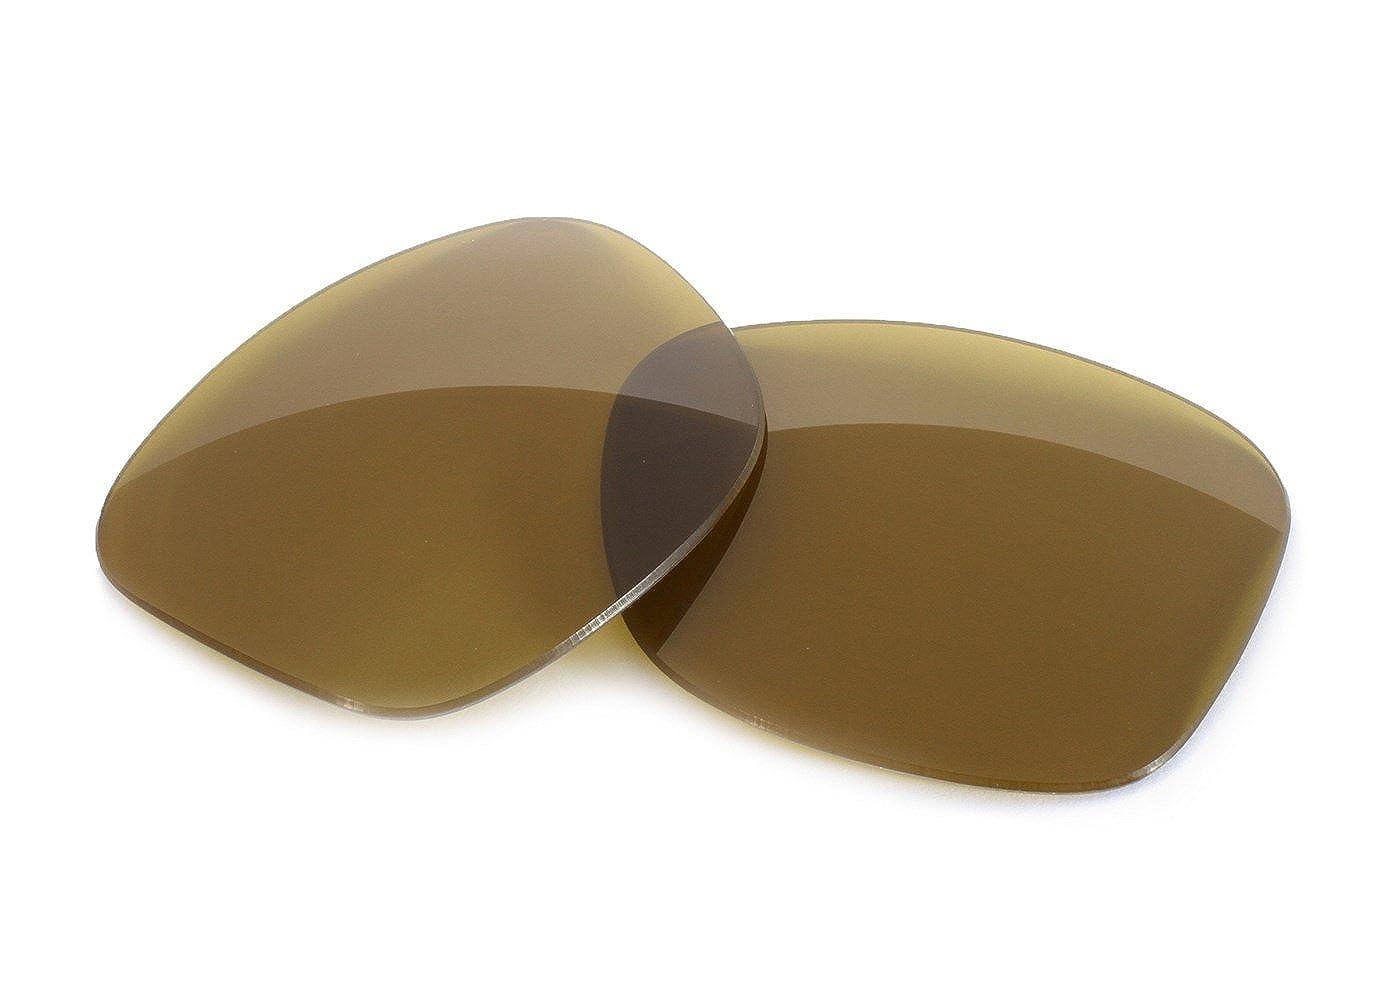 b98042acebc Amazon.com  FUSE Lenses for Dita Mach One Yellow Polarized Lenses  Clothing